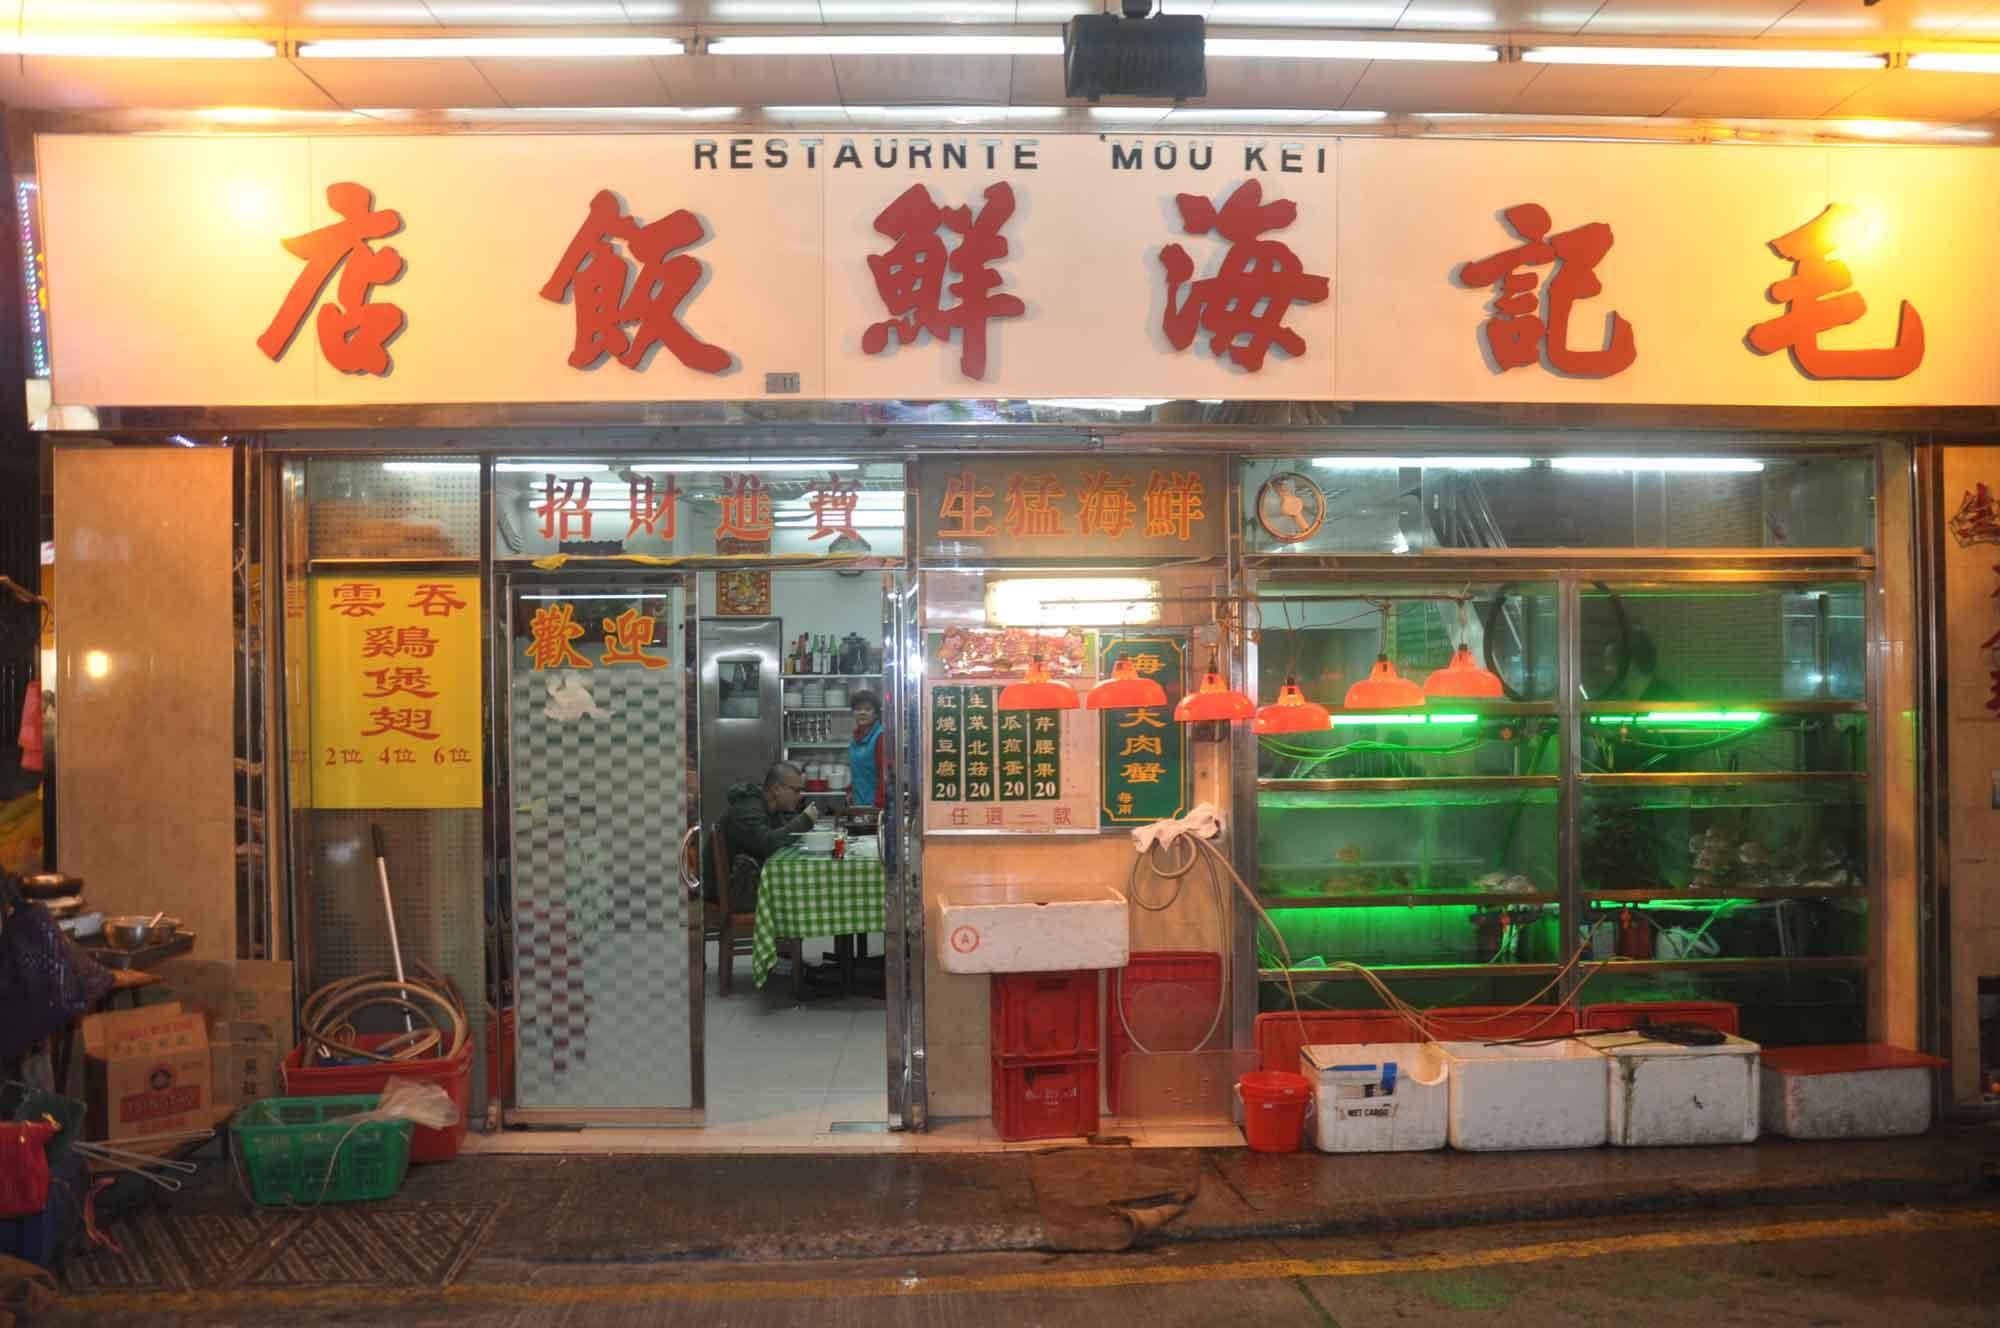 Mou Kei seafood restaurant